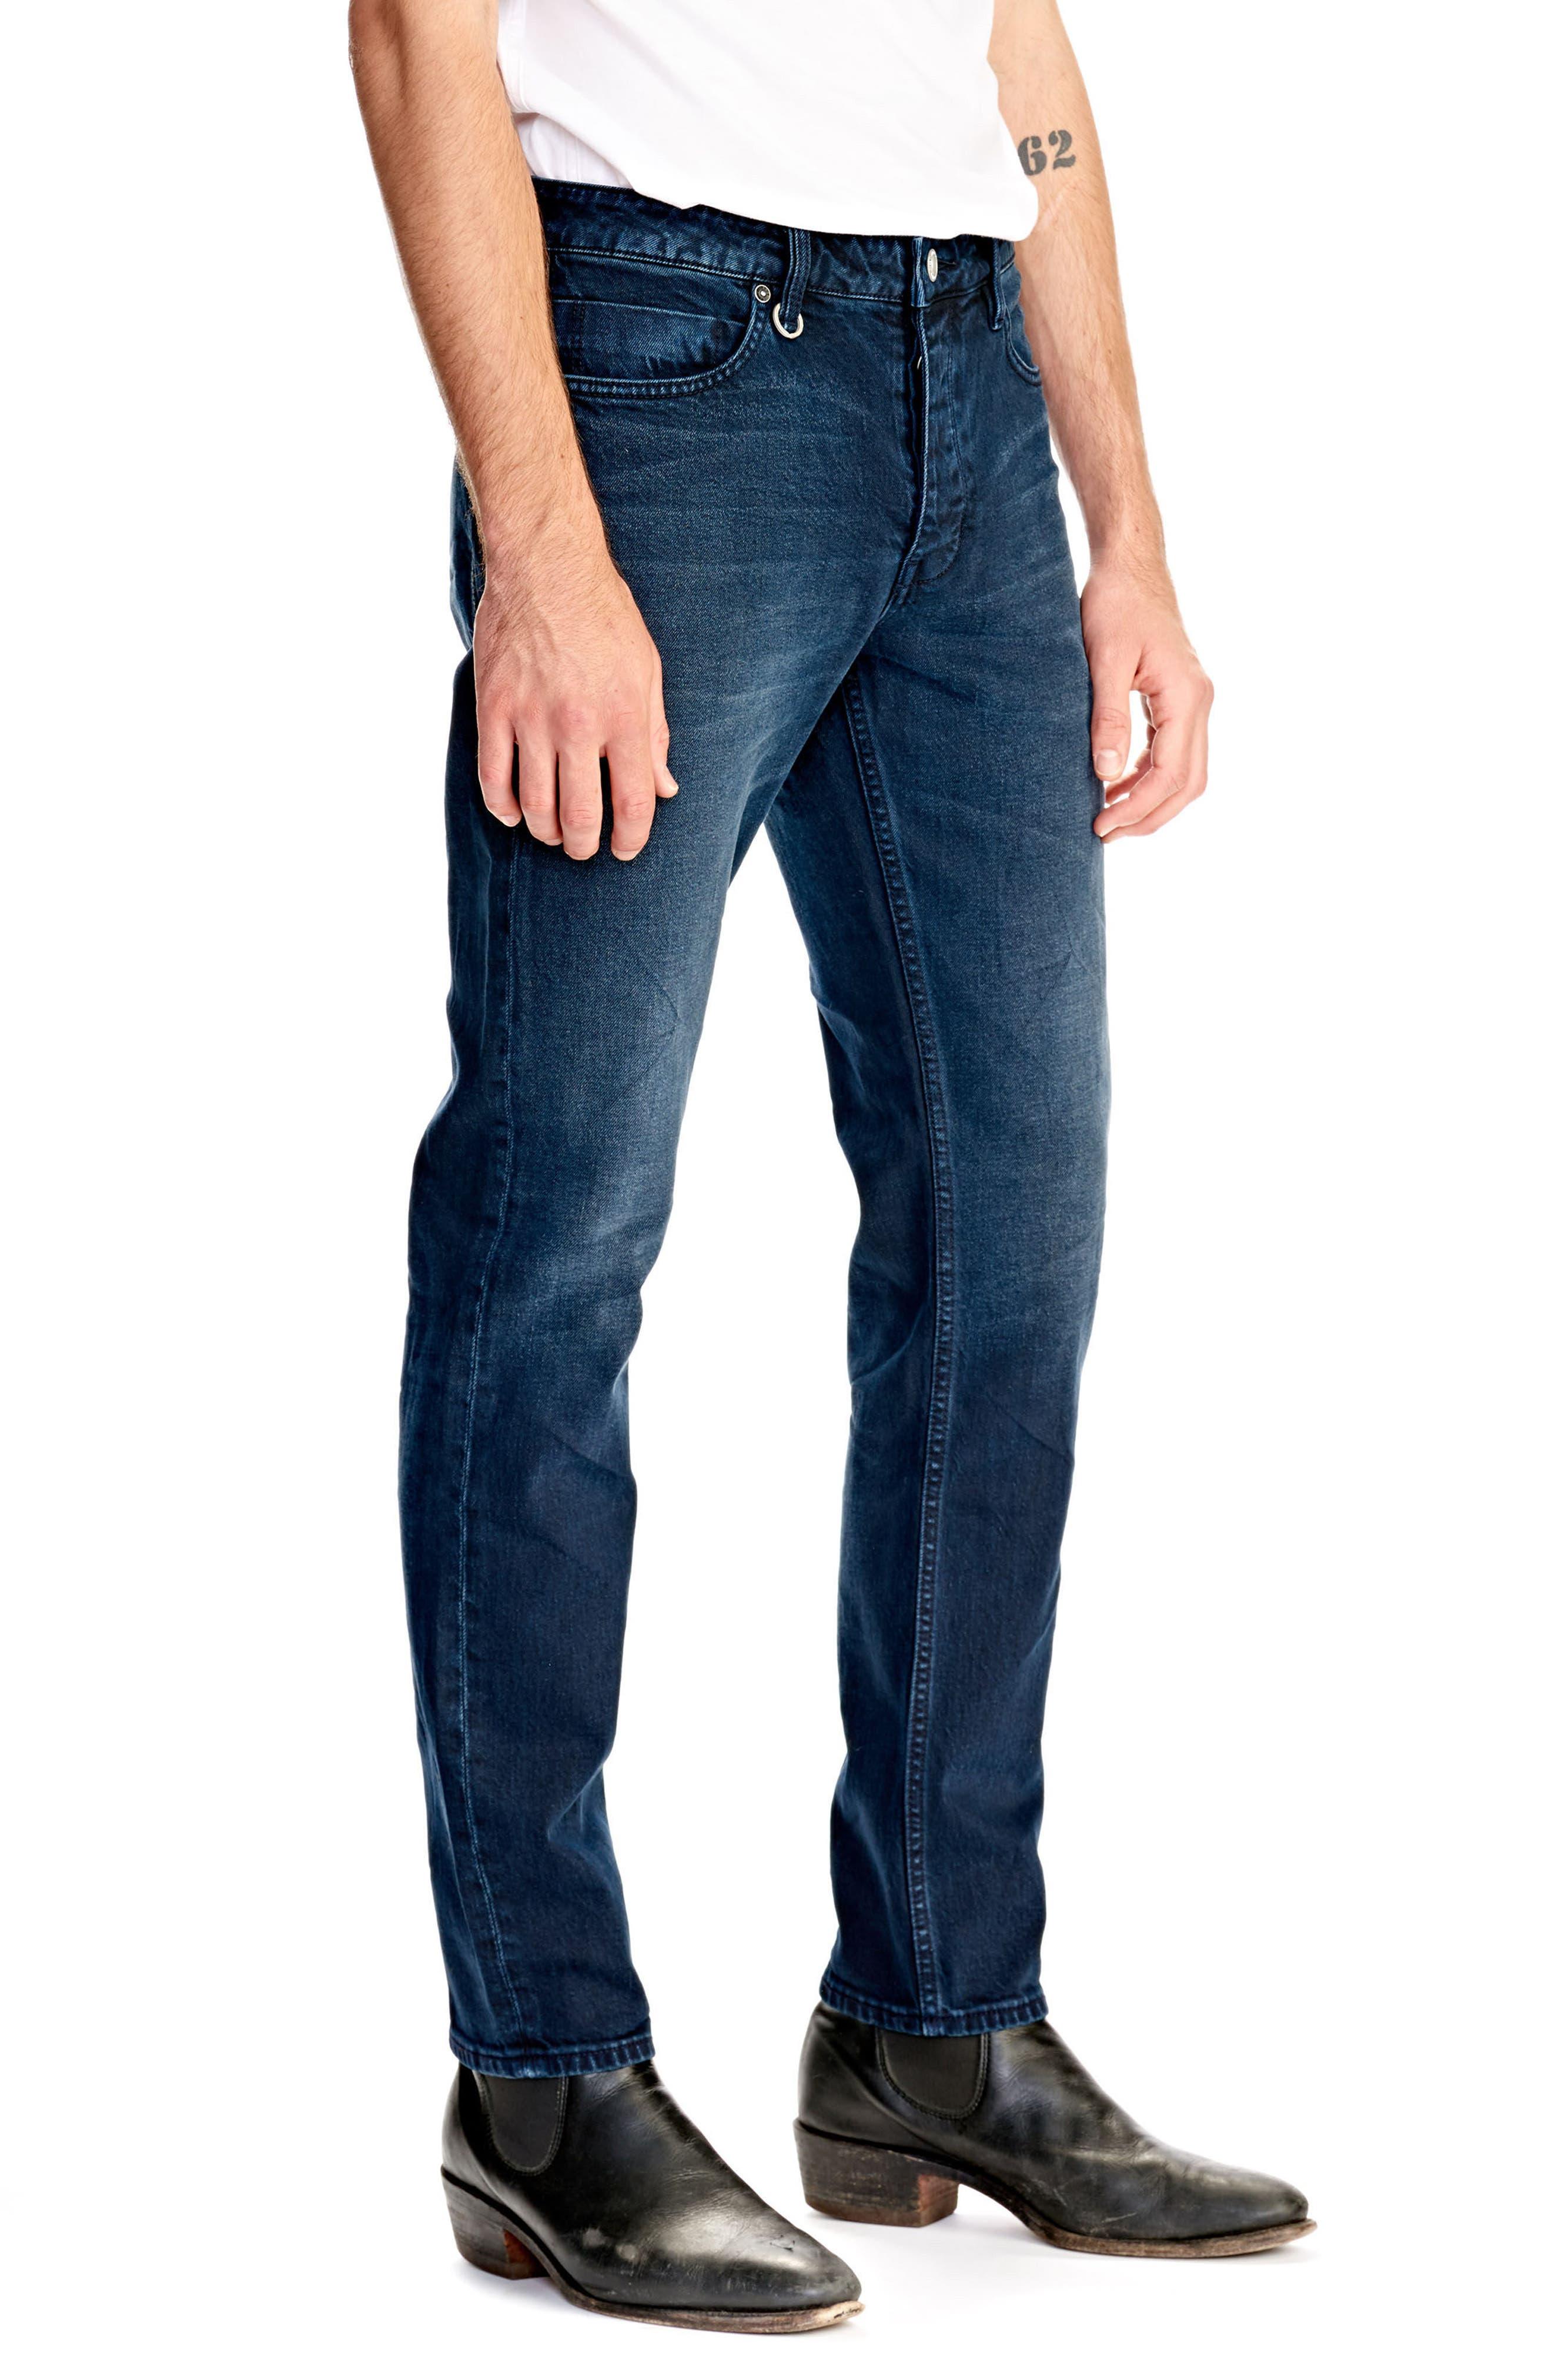 Lou Slim Fit Jeans,                             Alternate thumbnail 3, color,                             Zydeco